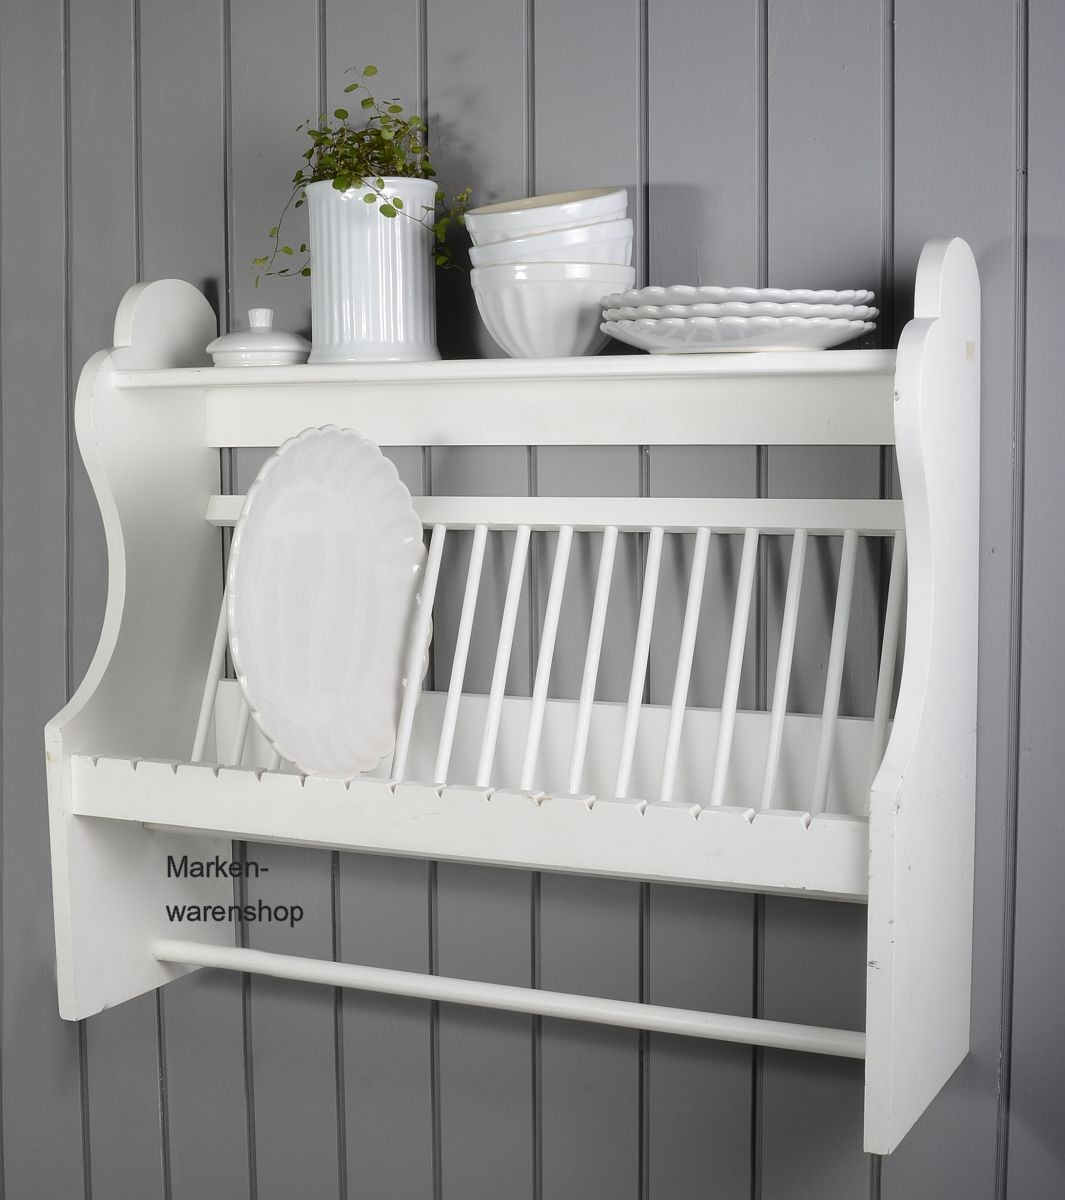 laursen tellerregal stange holz wei 7206 11 regal wandregal k chenregal shabby ebay. Black Bedroom Furniture Sets. Home Design Ideas